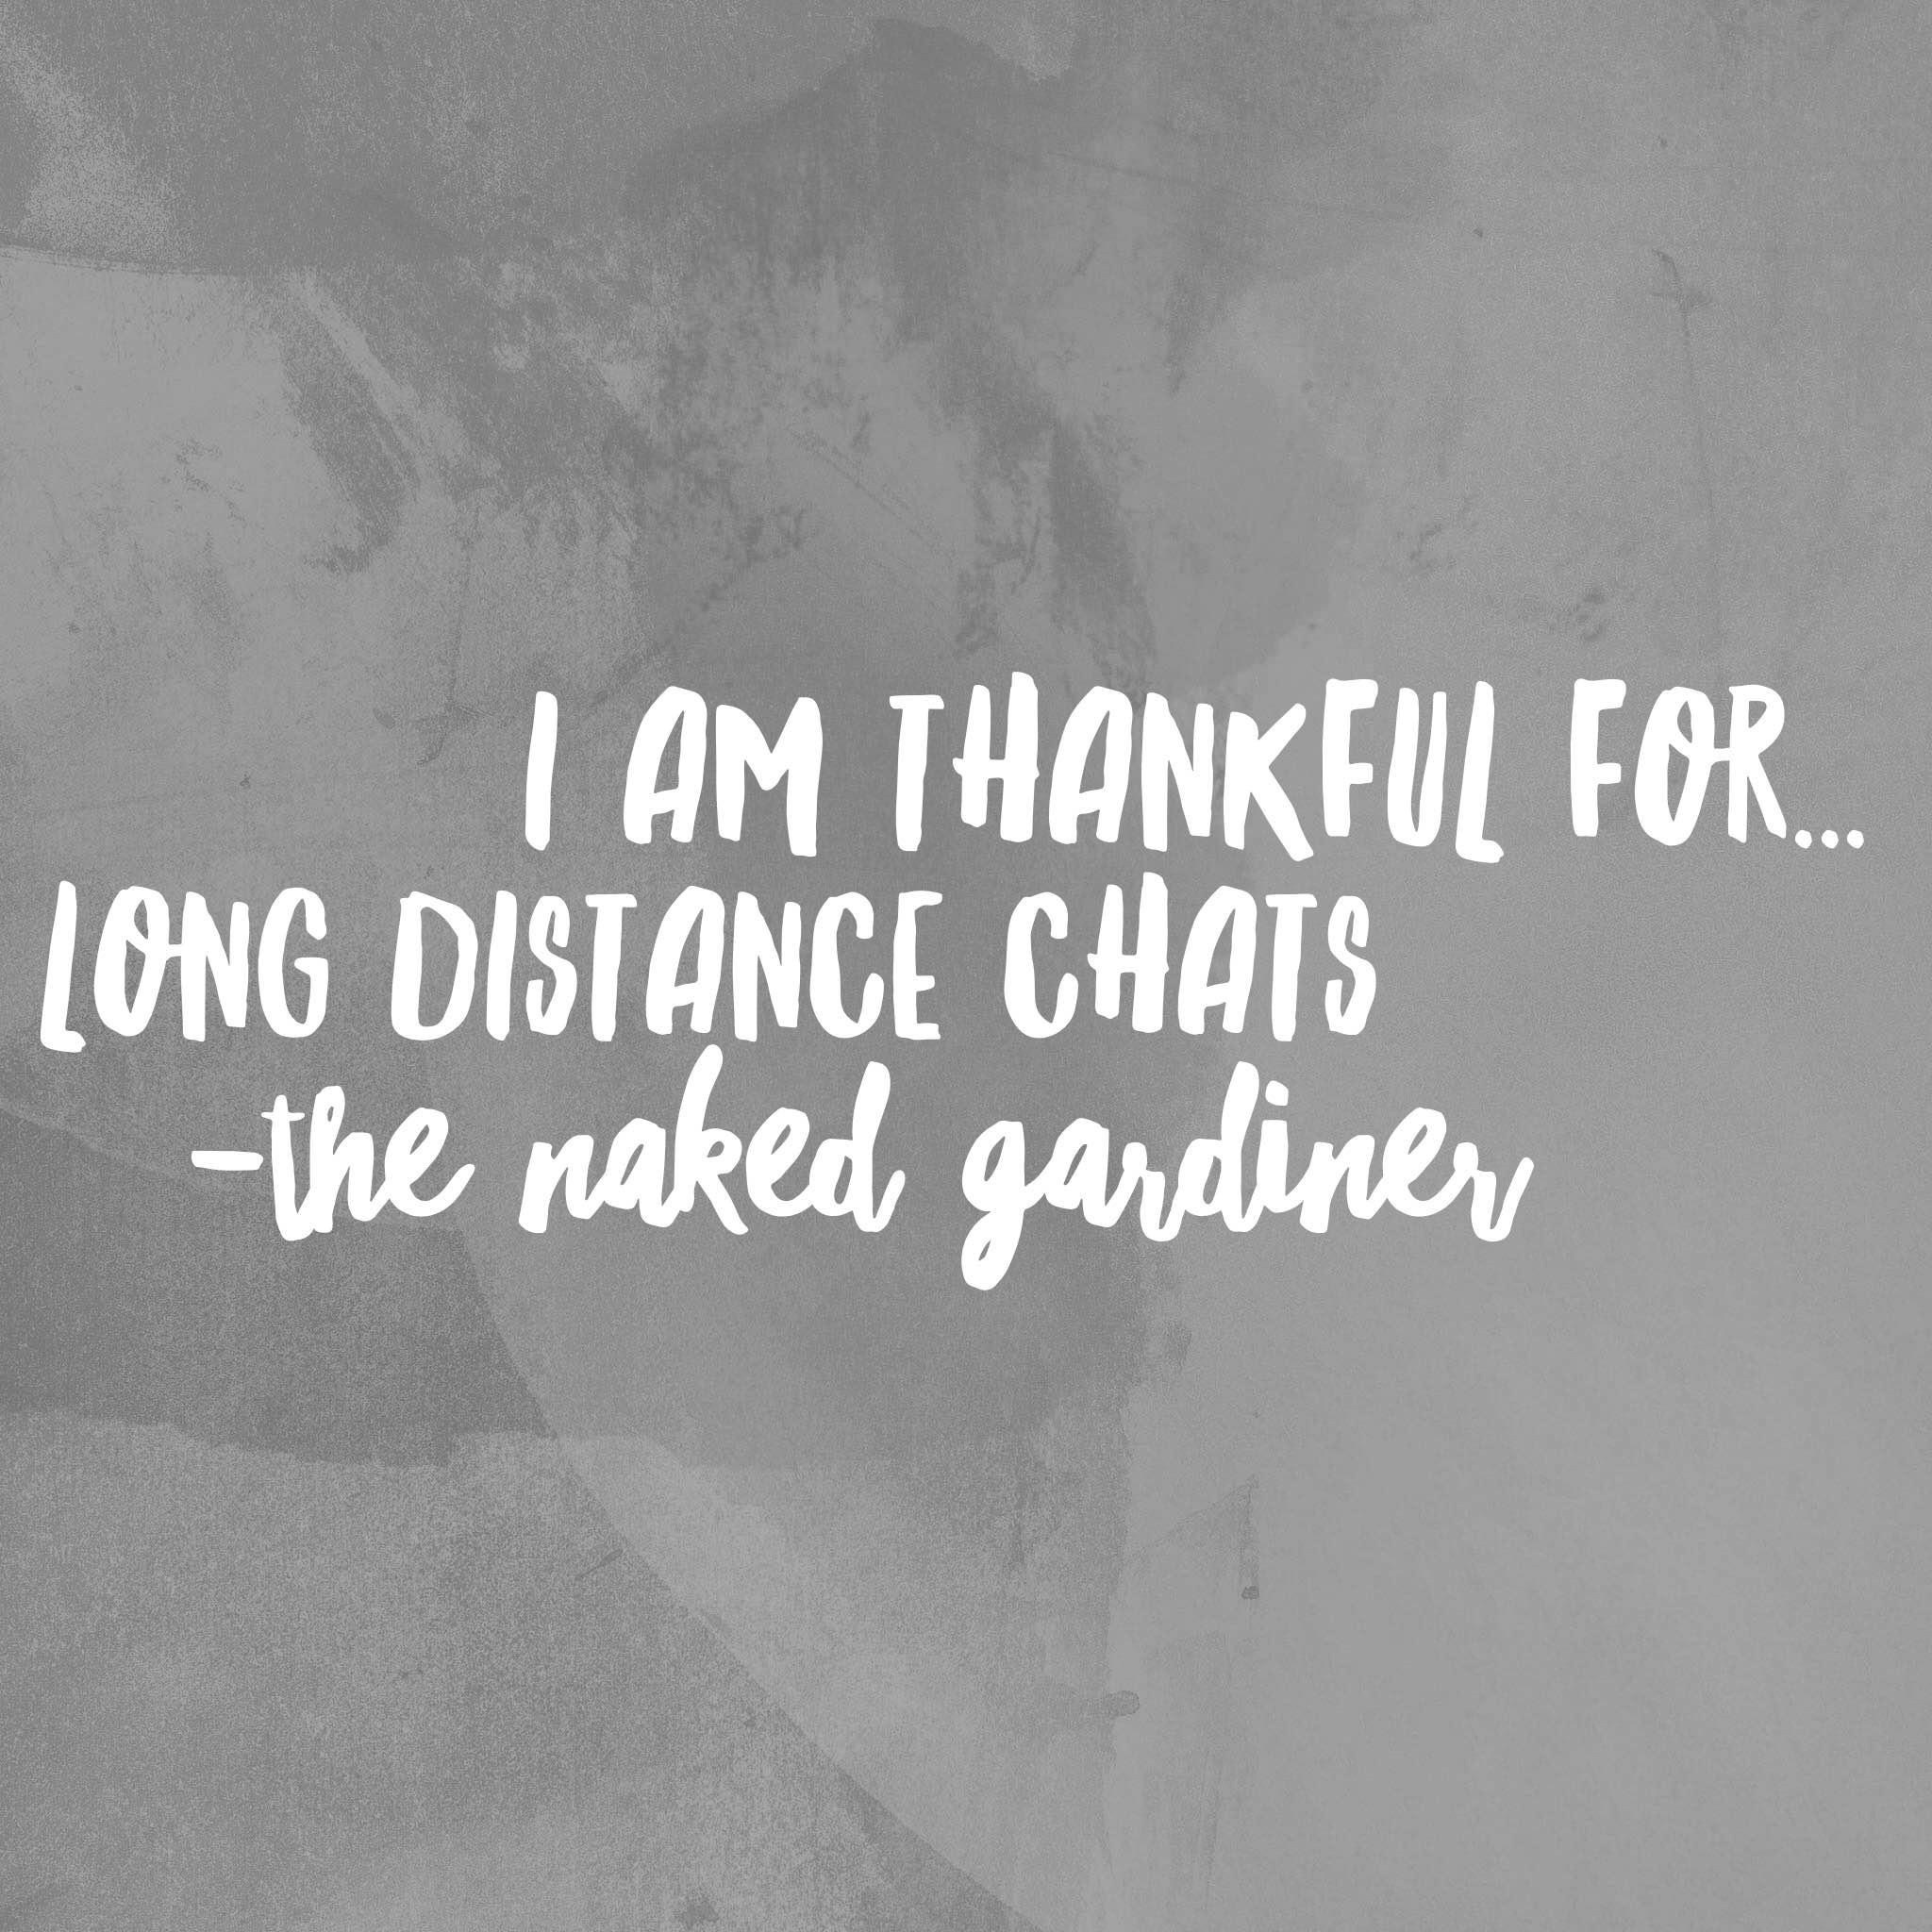 thankful-thursdays-long-distance-chats-thenakedgardiner